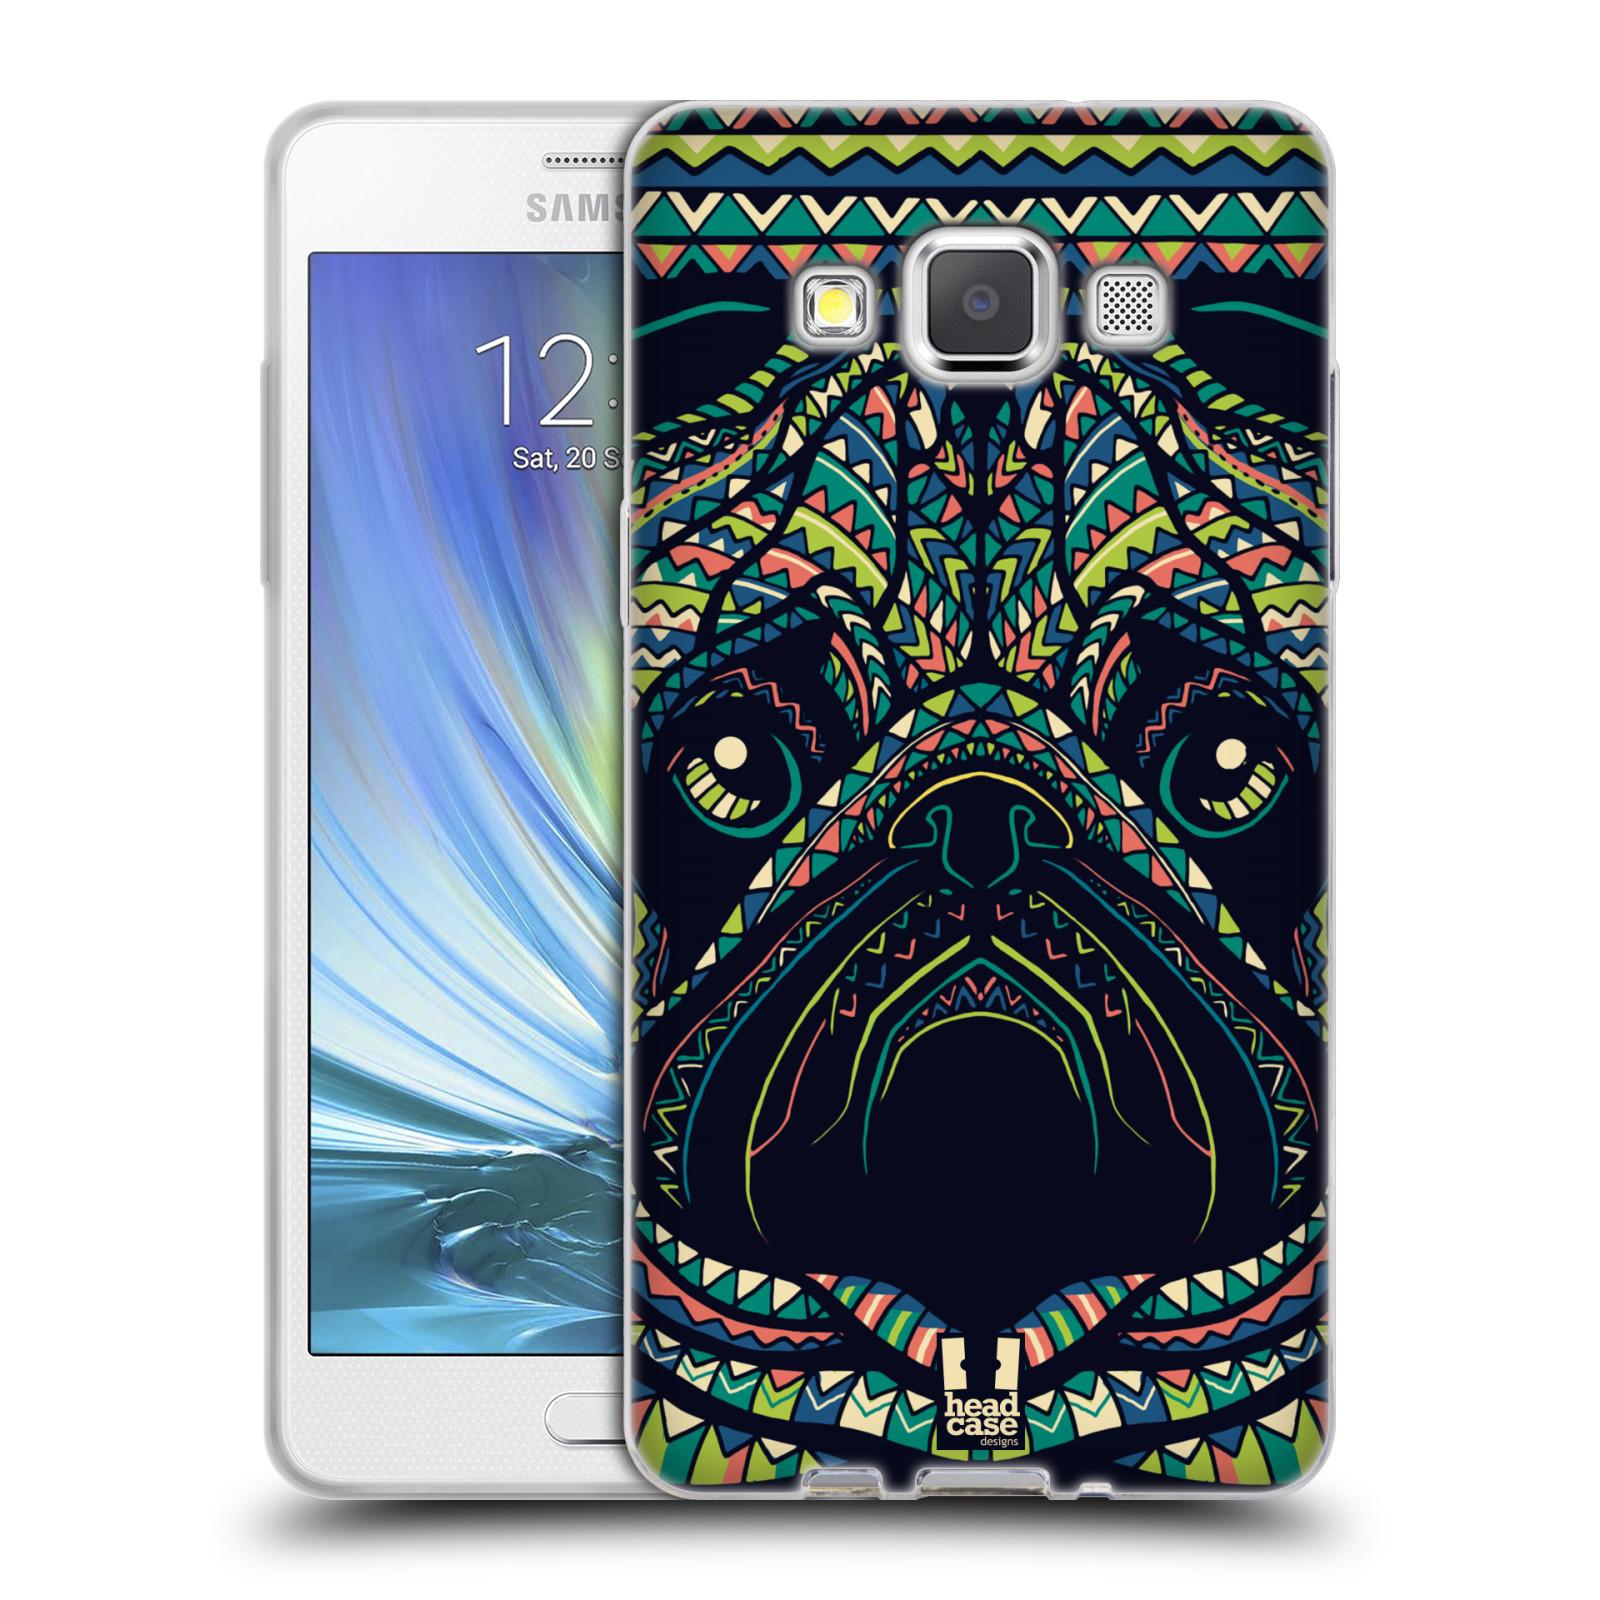 HEAD CASE silikonový obal na mobil Samsung Galaxy A5 vzor Aztécký motiv zvíře 3 mopsík